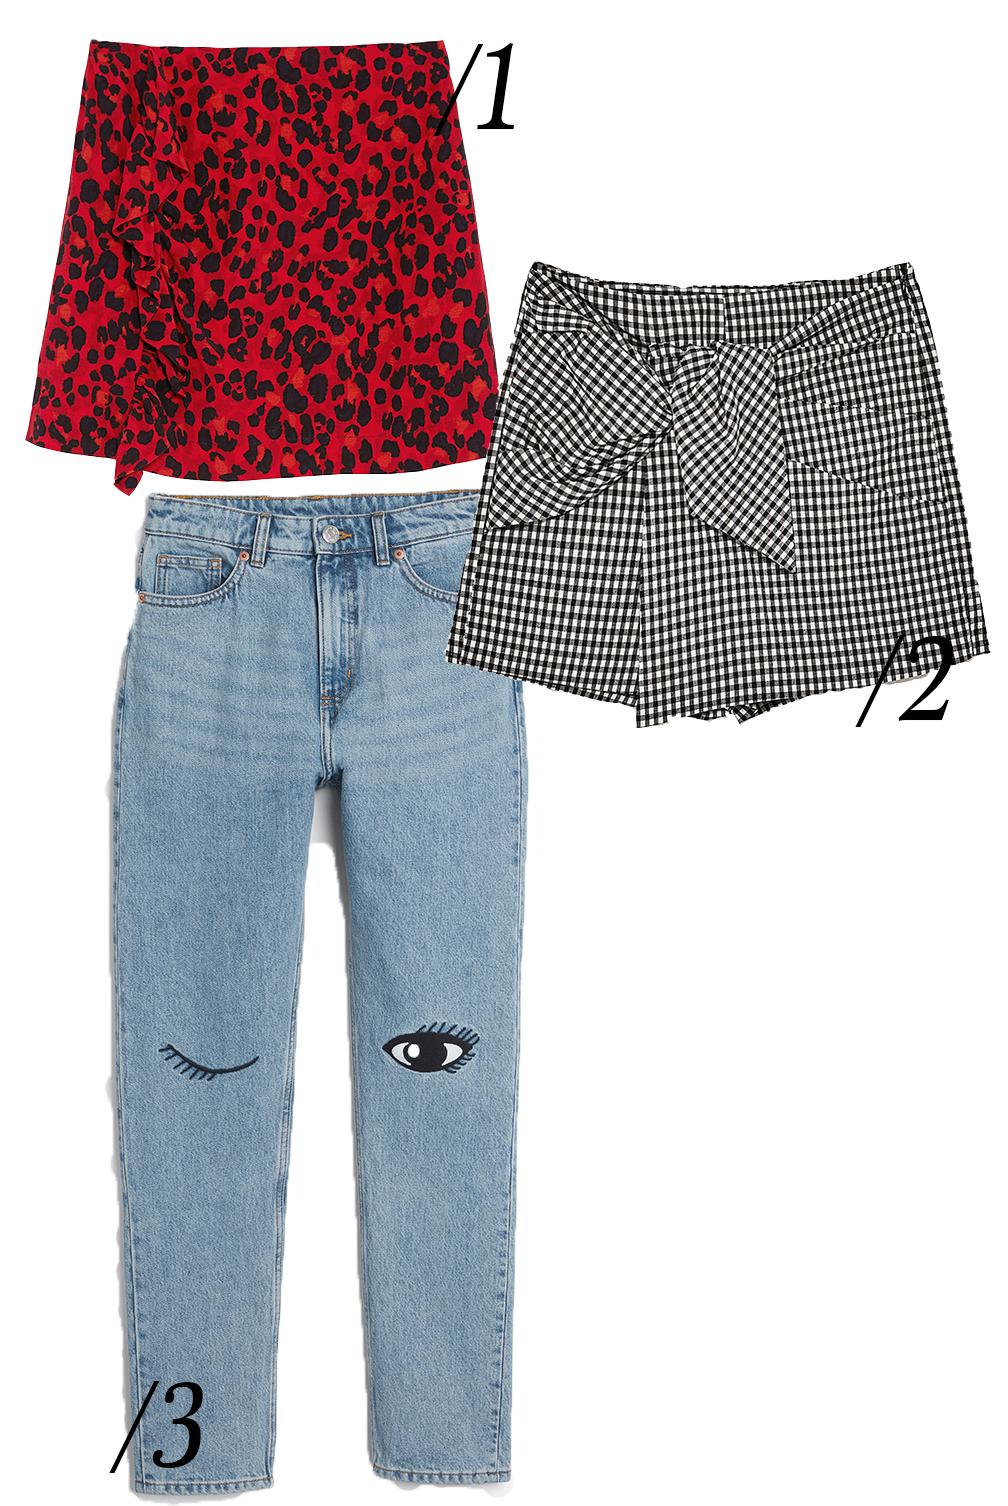 zara-check-skirt